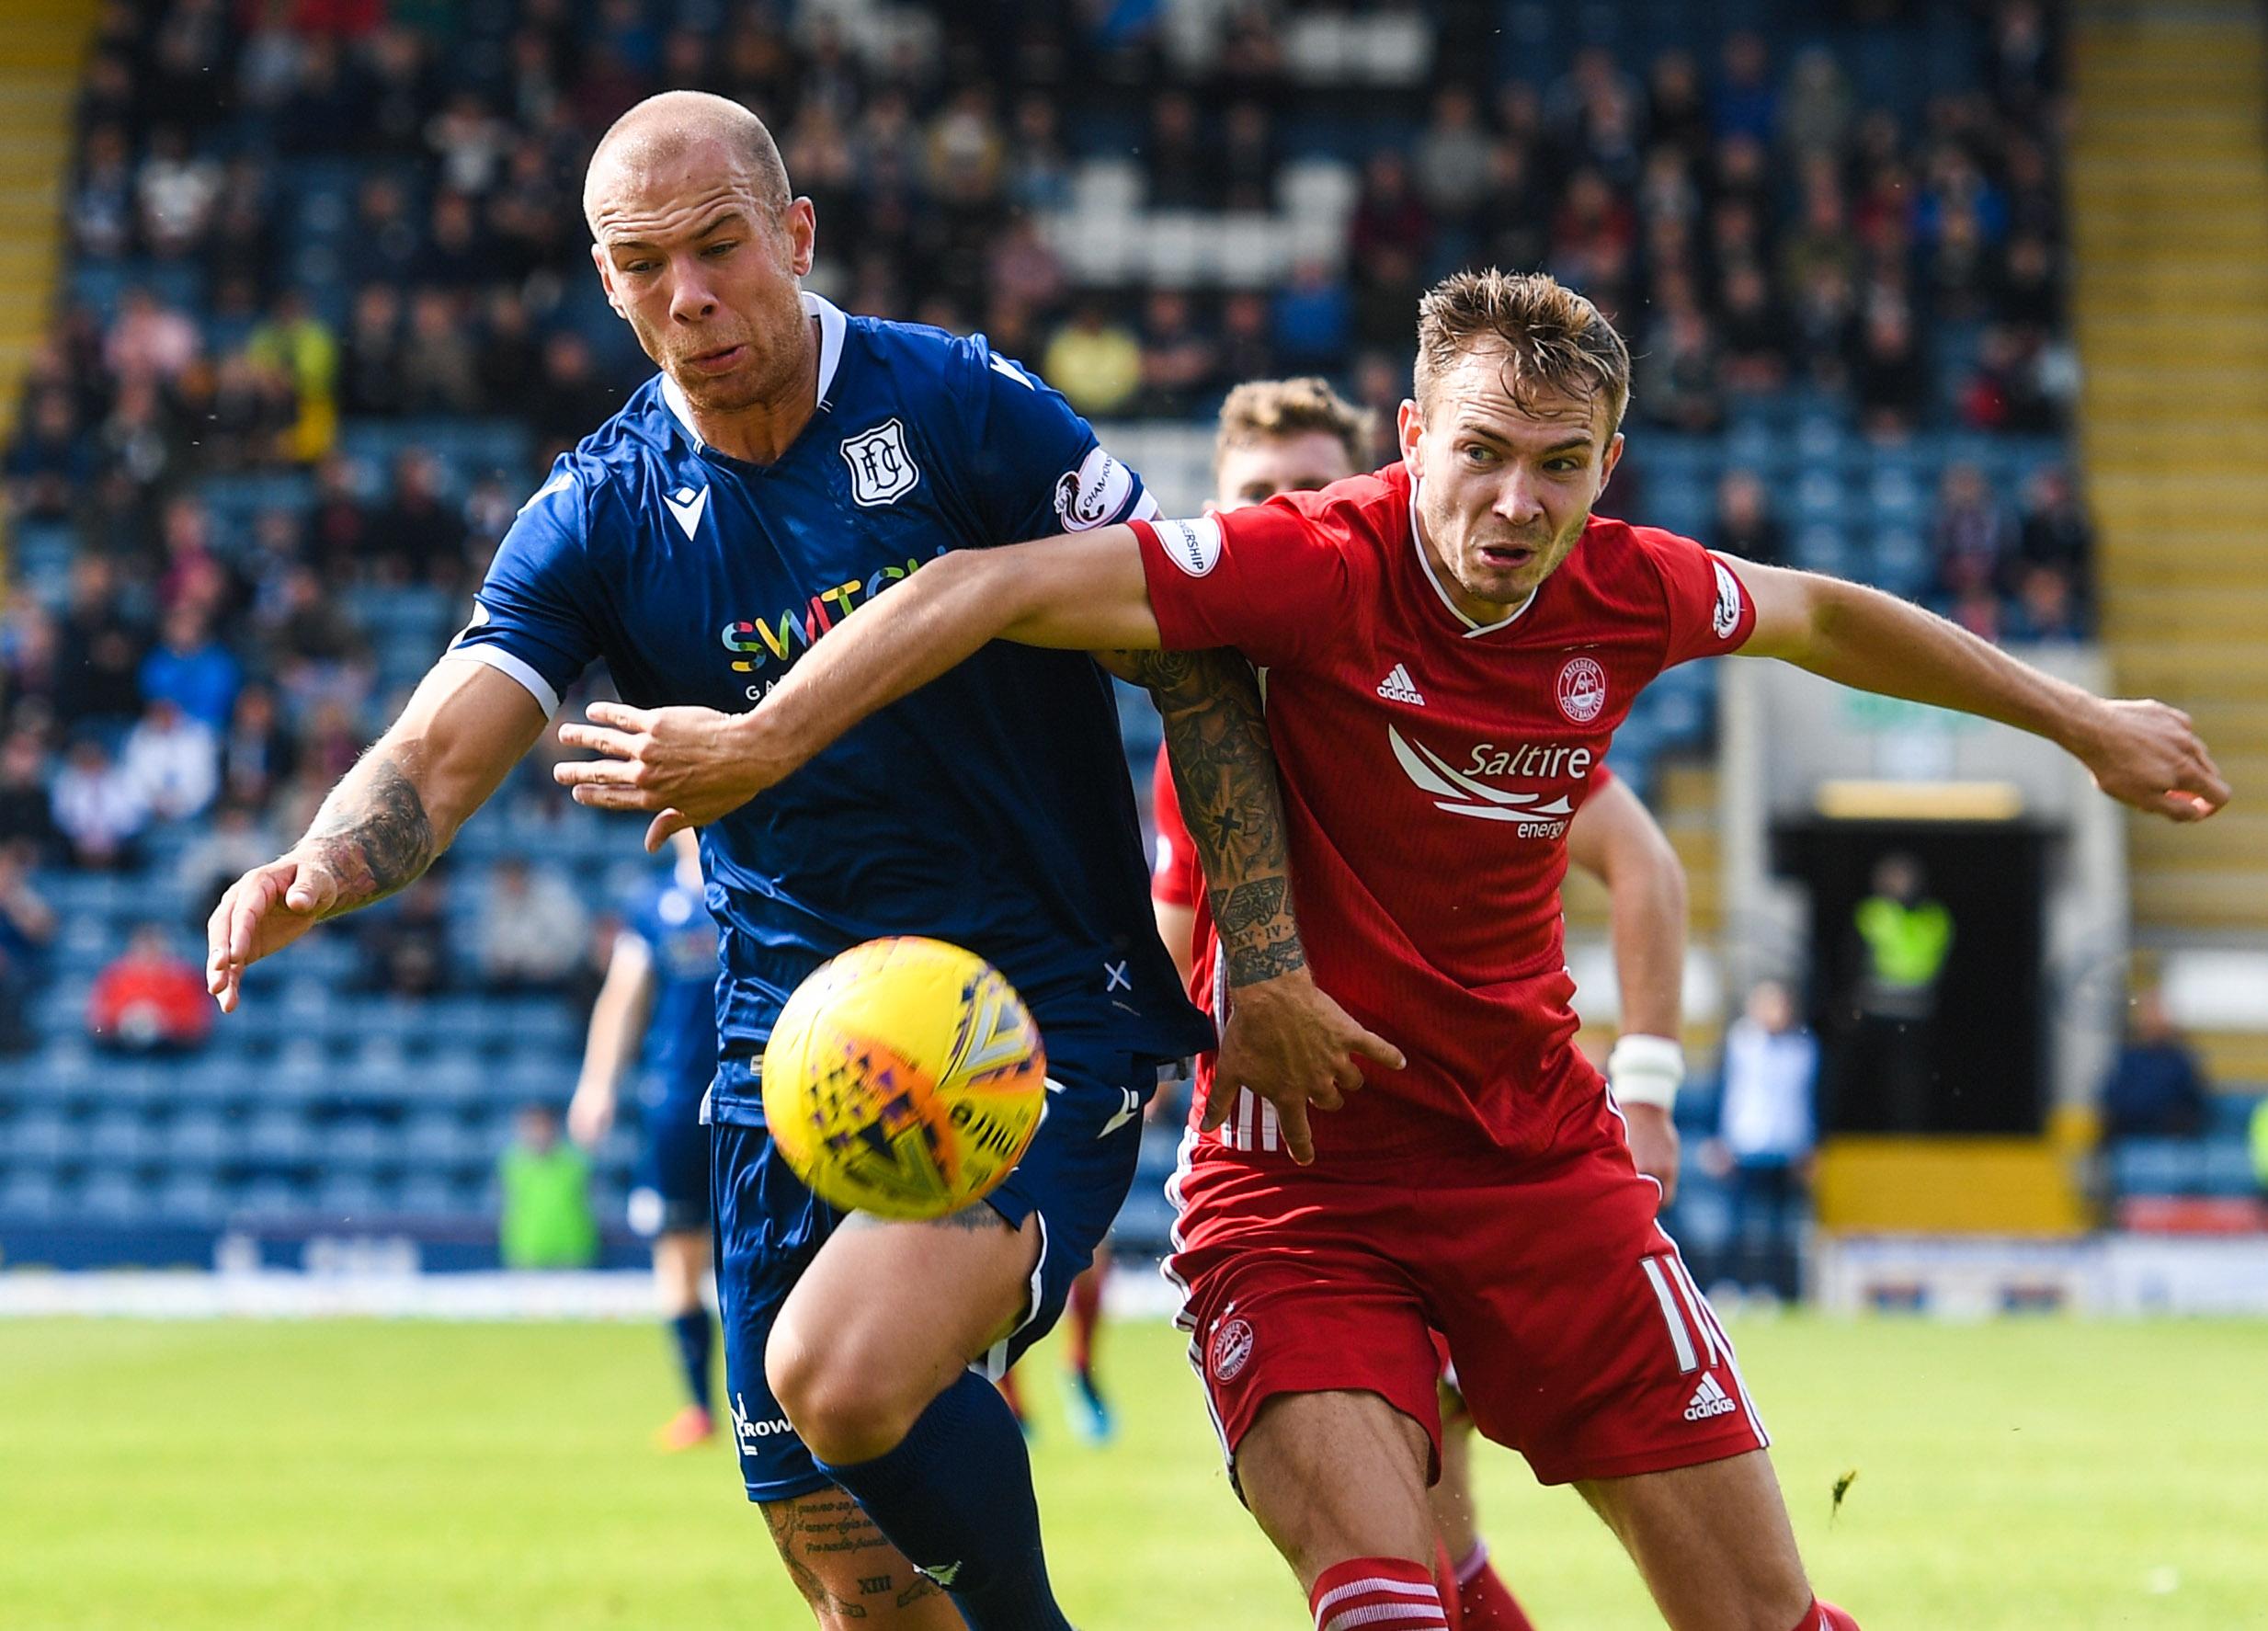 Aberdeen's Ryan Hedges (right) holds off Jordon Forster